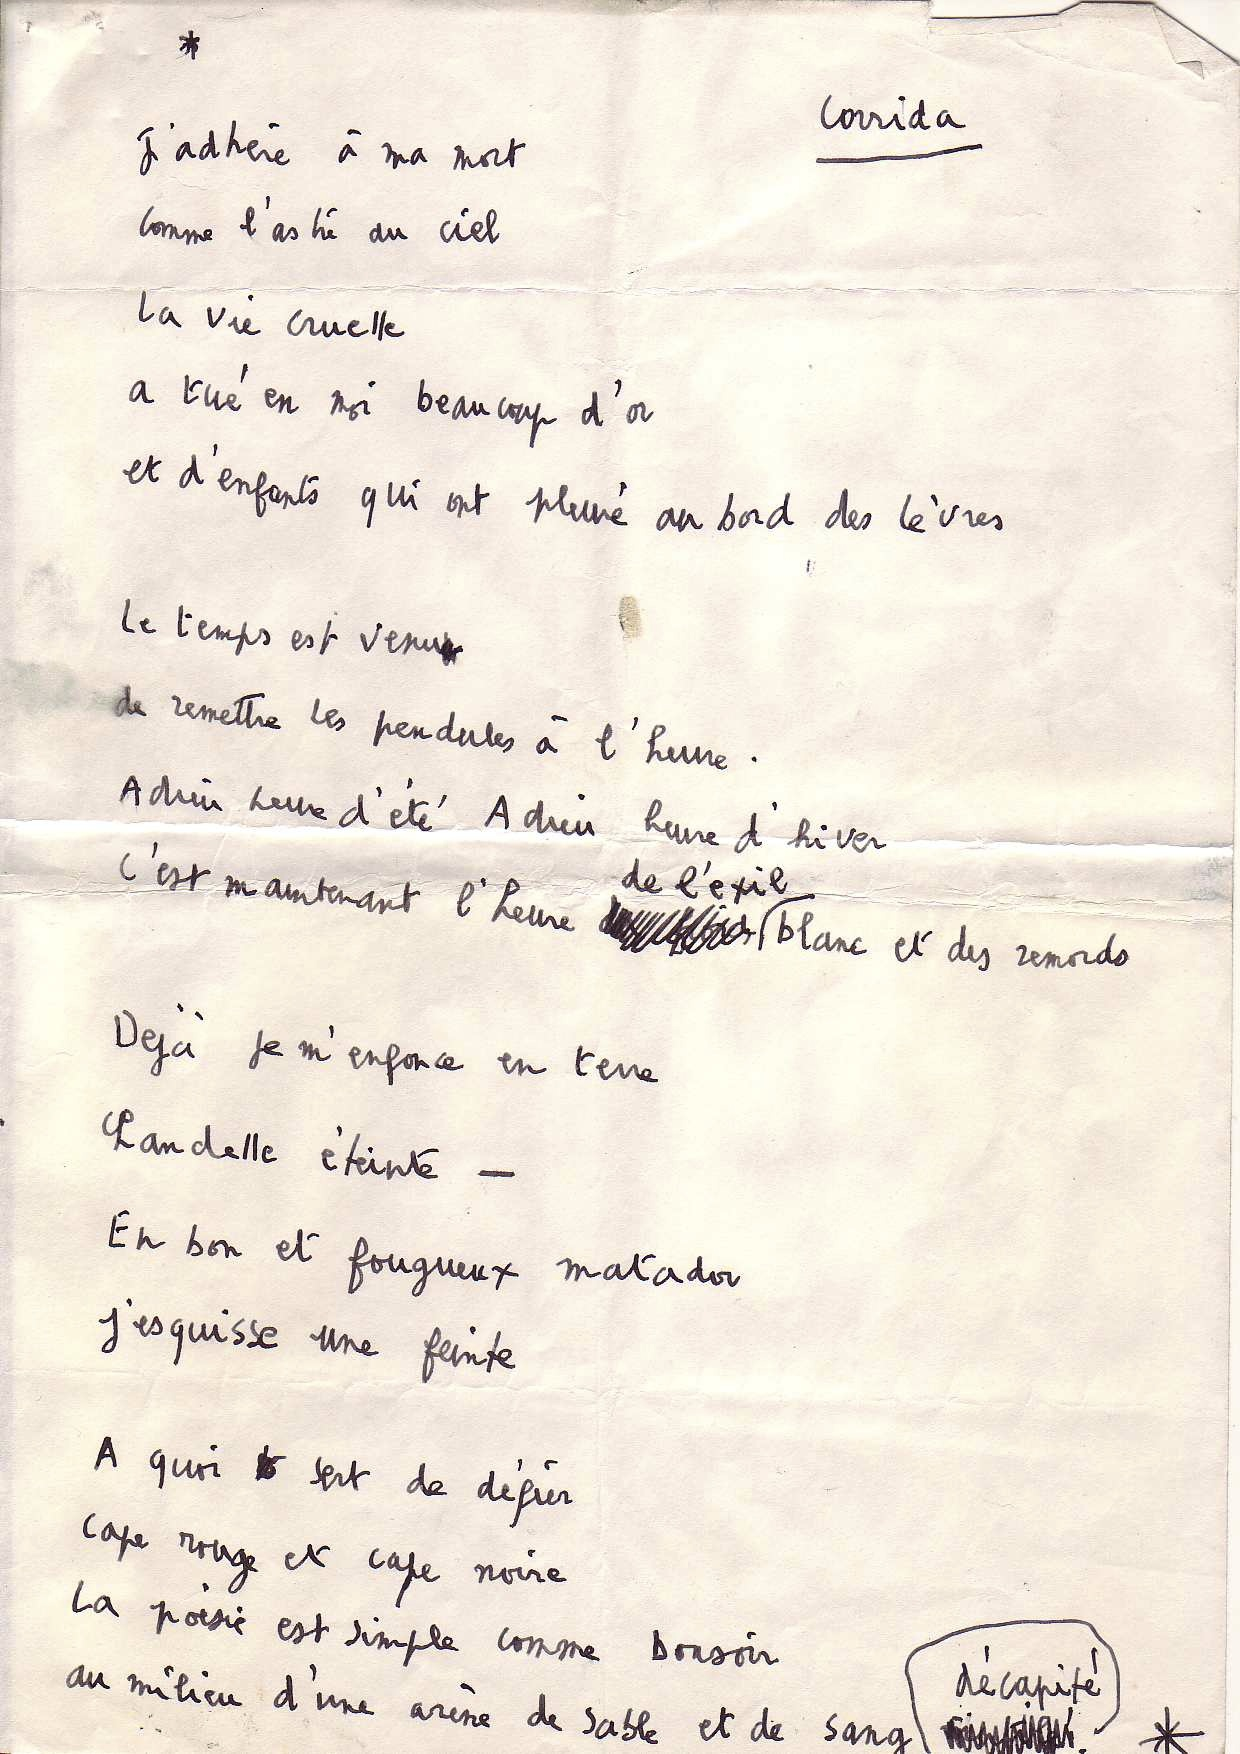 Corrida, André Laude